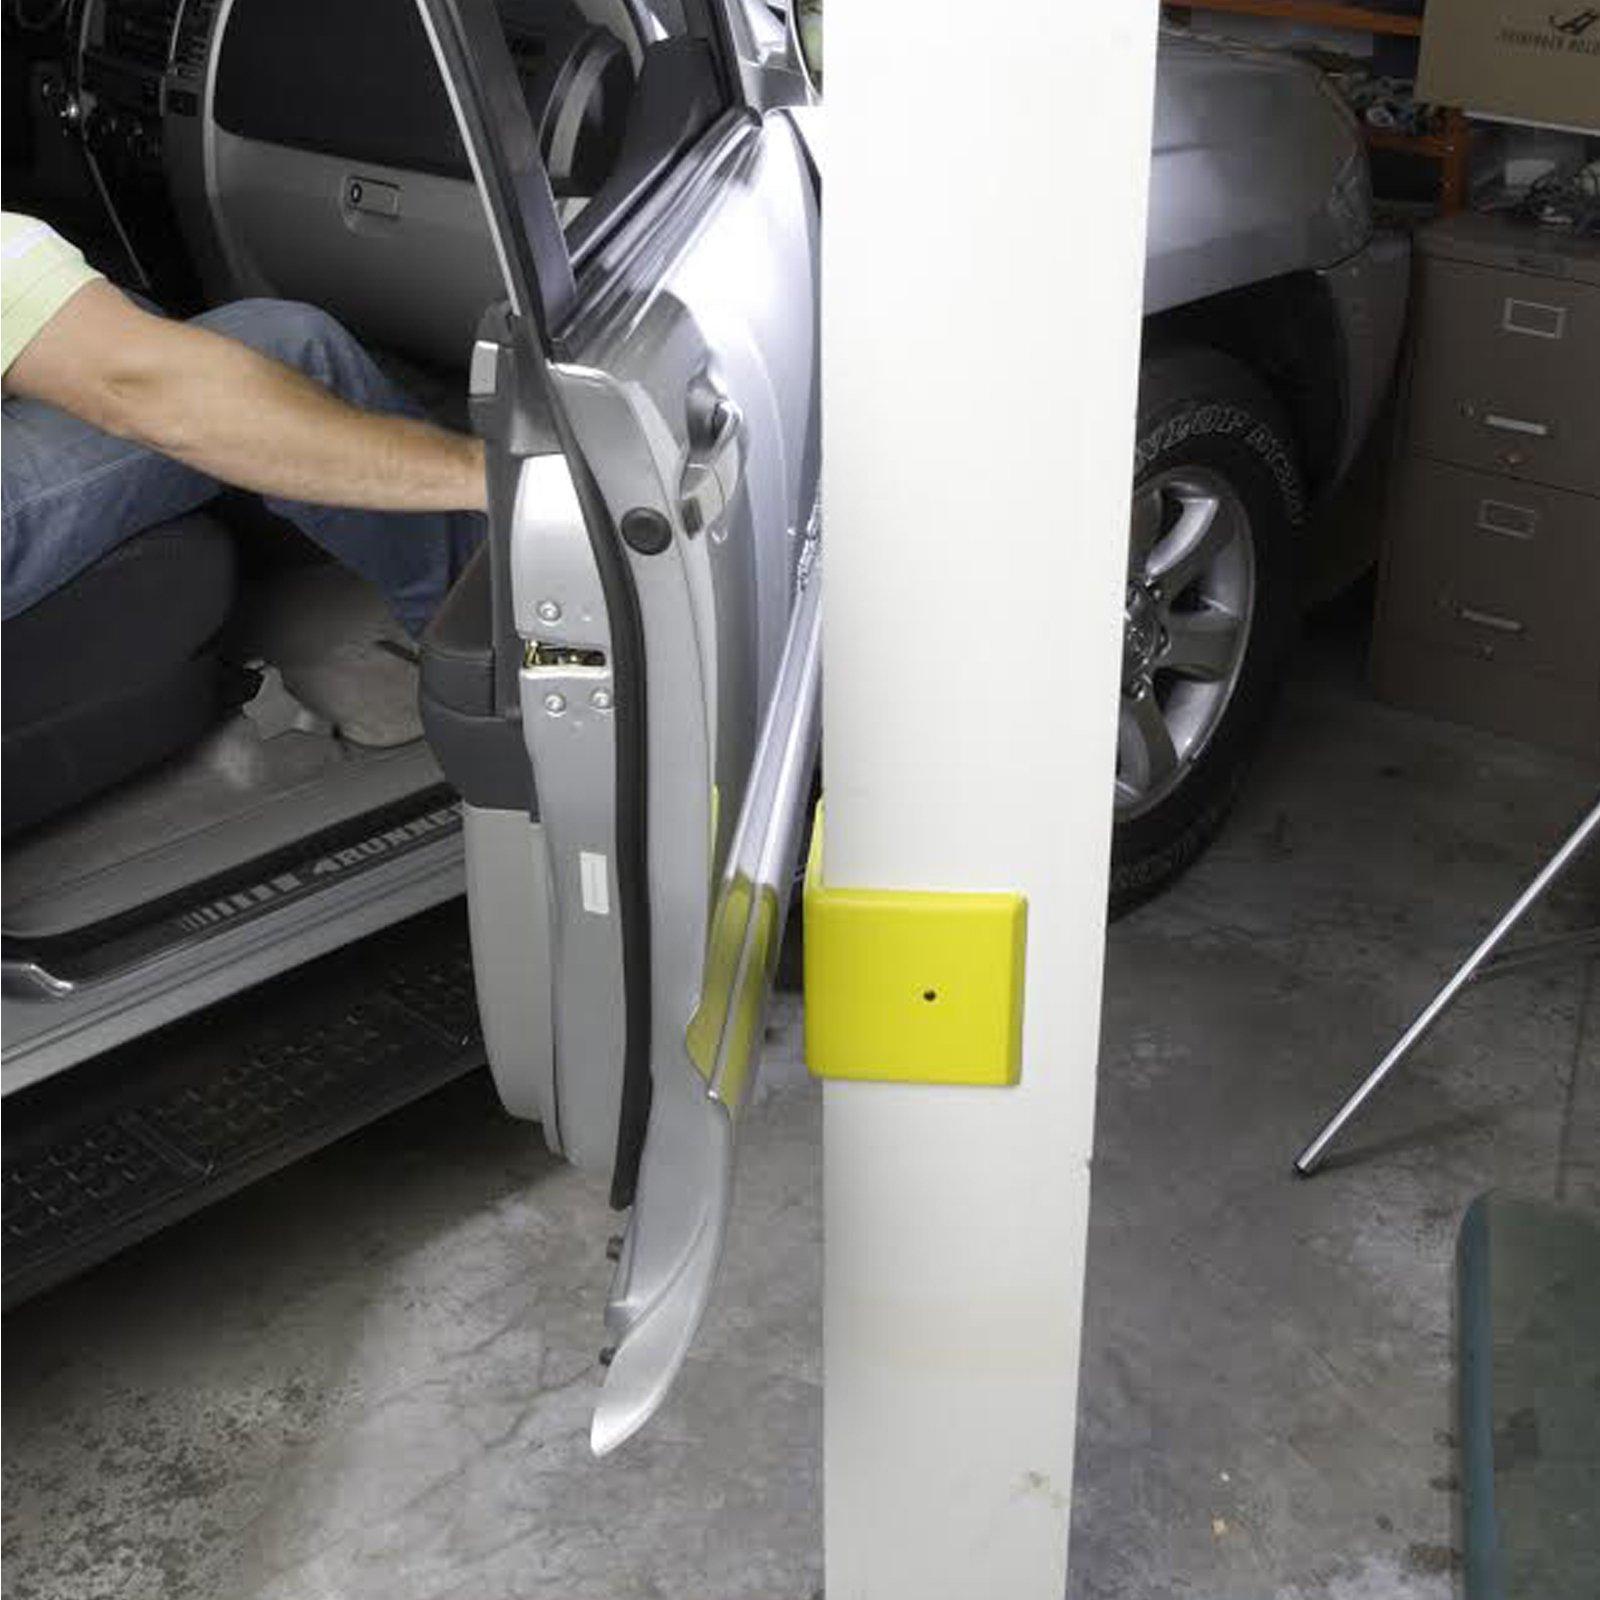 Heininger Door Defender Corner Guard 2-Pack Car Garage Truck Automotive Protection Pad